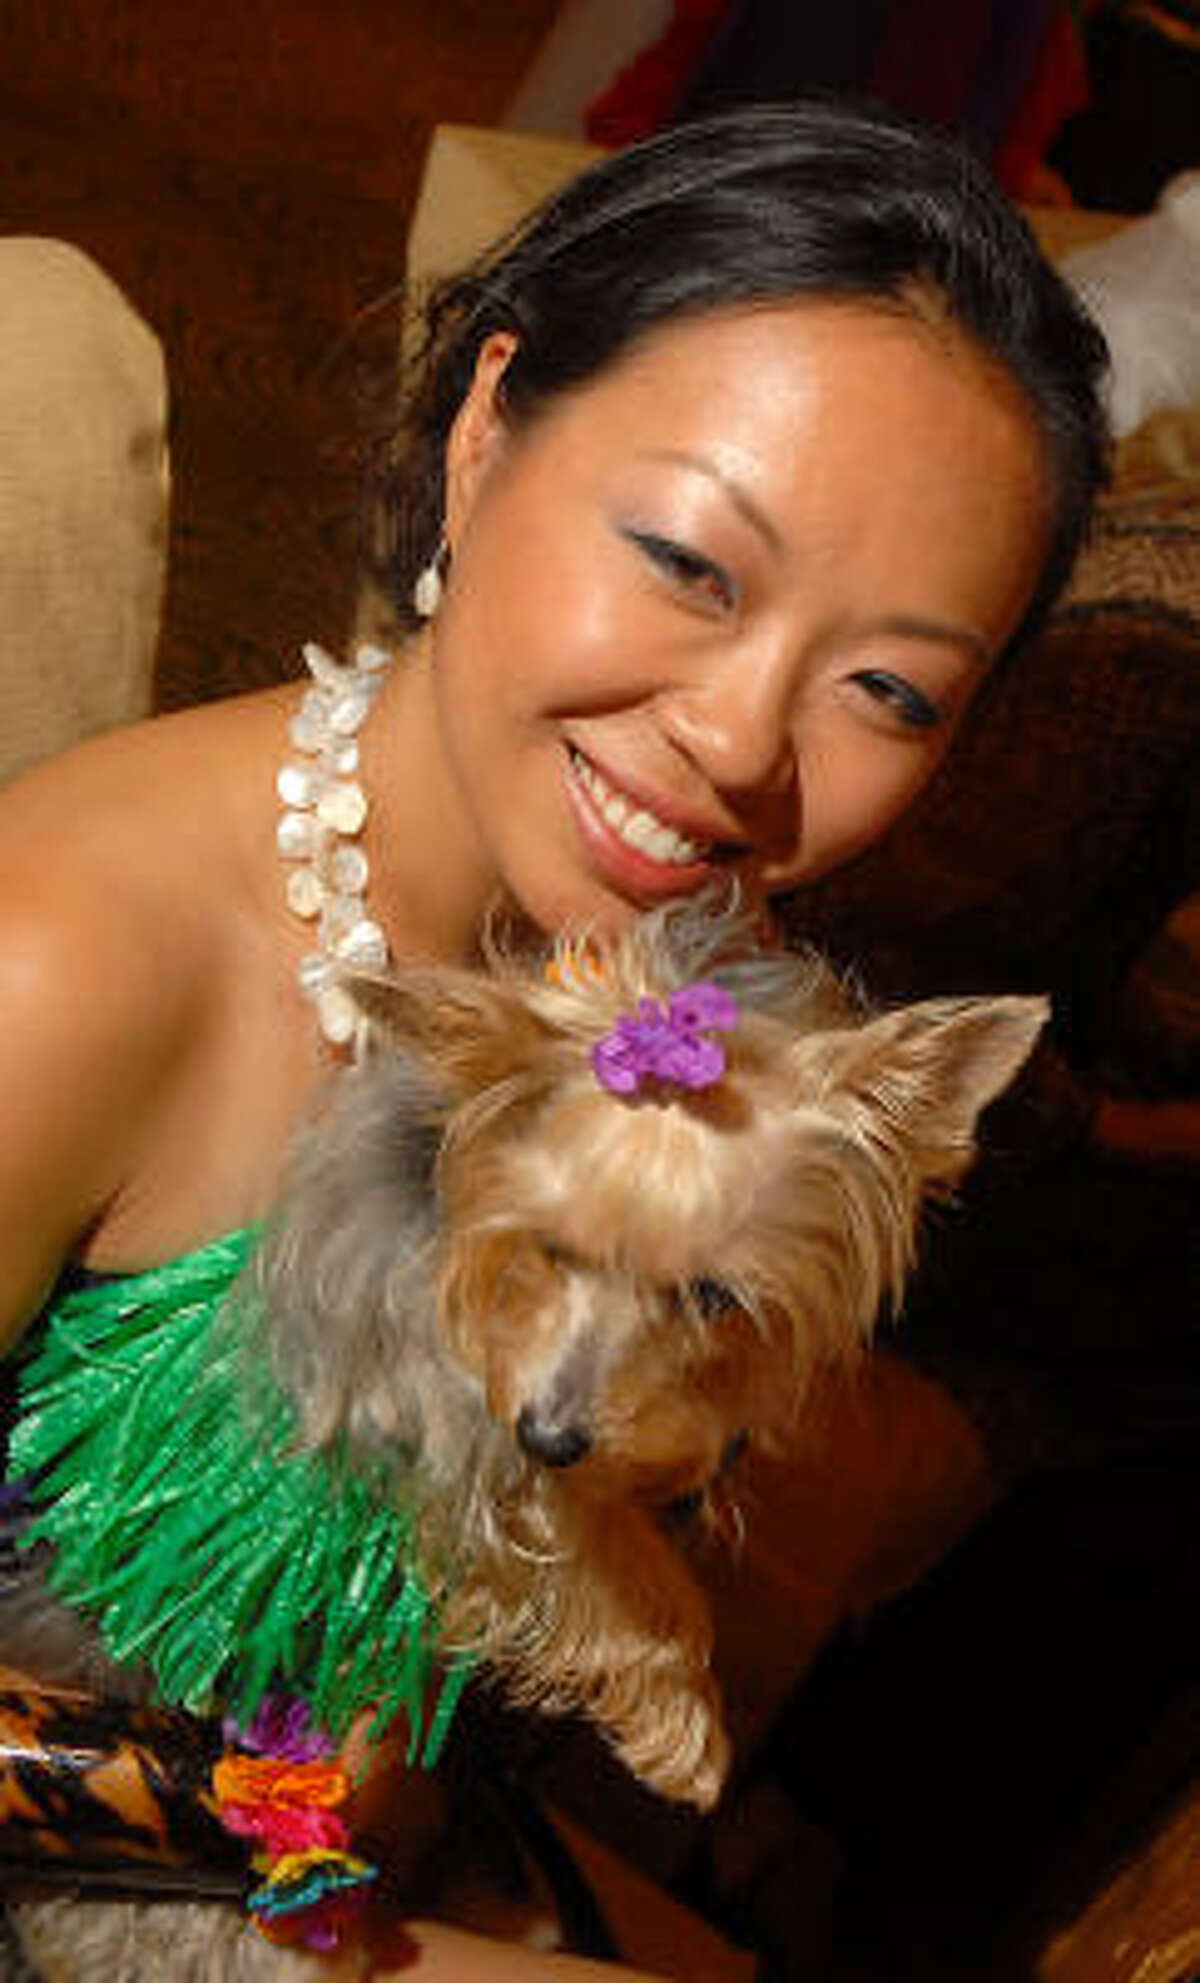 Miiya Shay with her dog Mei Ling